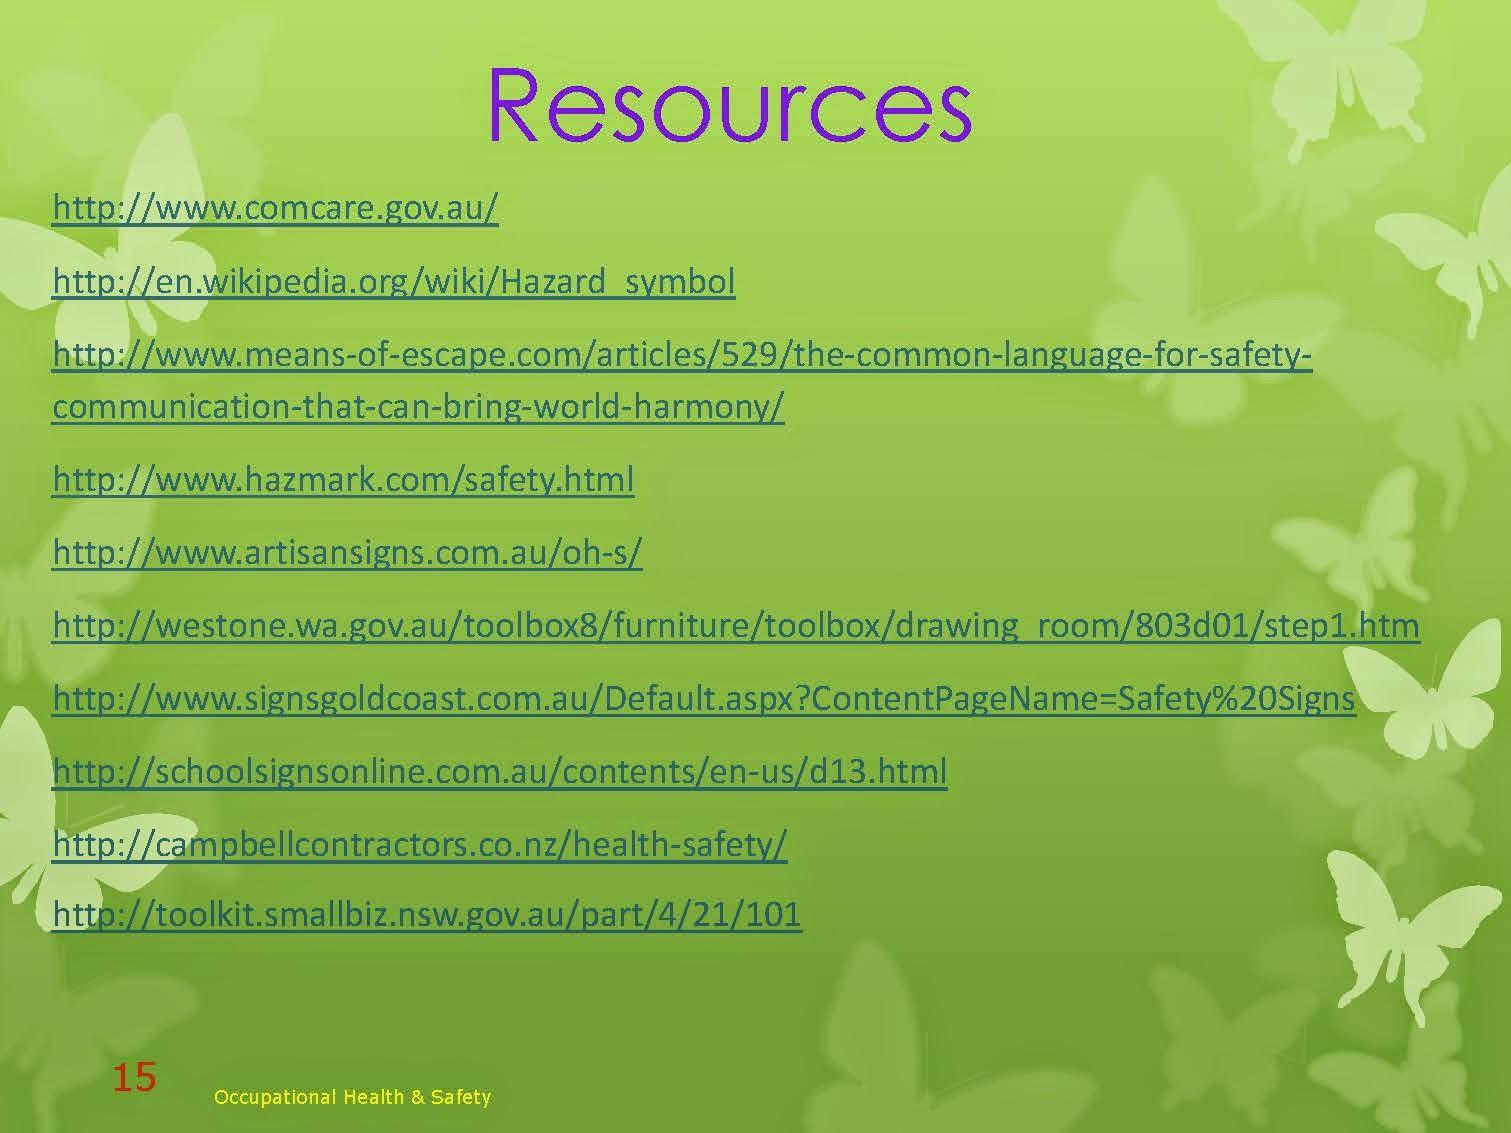 RESOURCES FOR DESIGNERS STUDIOS